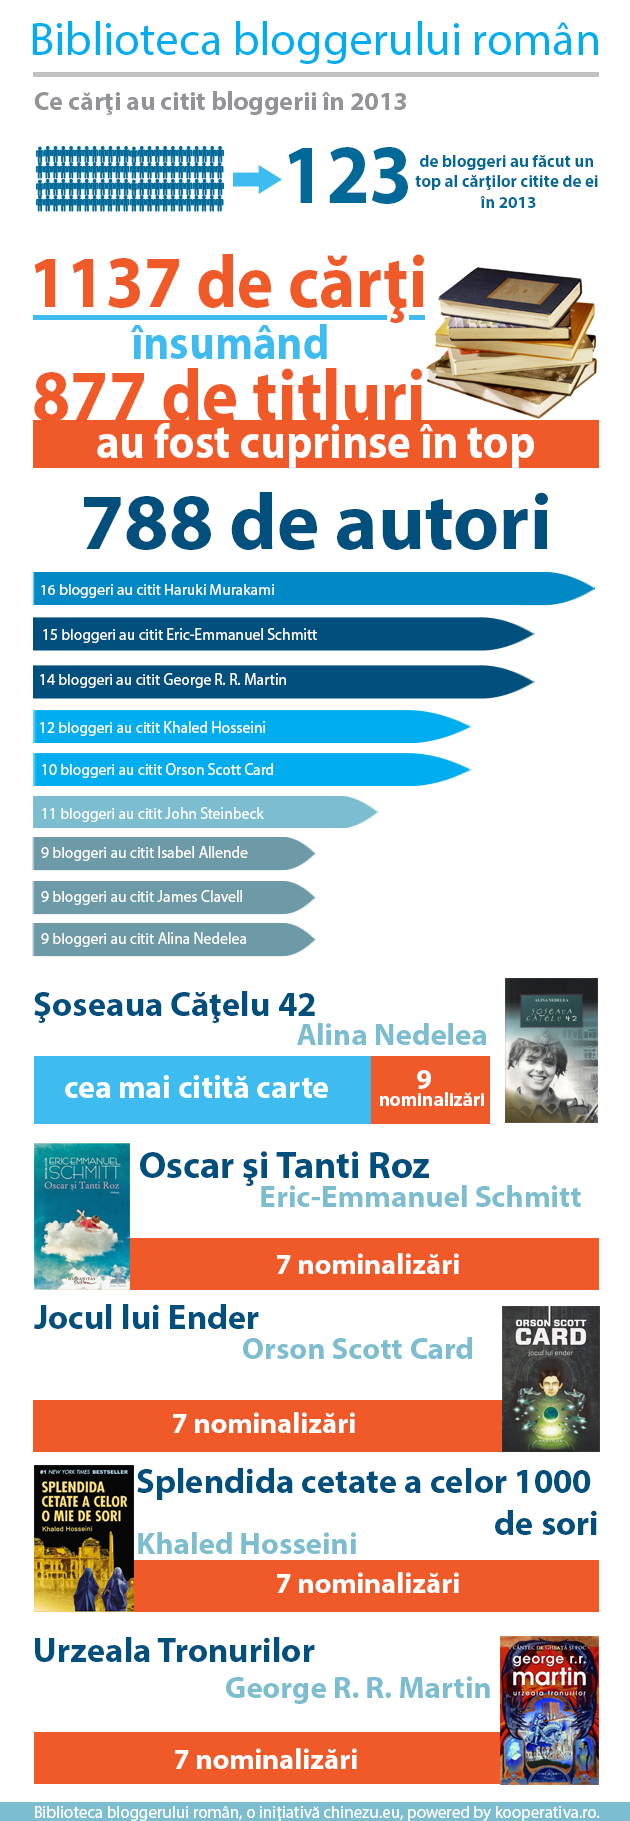 infografic biblioteca